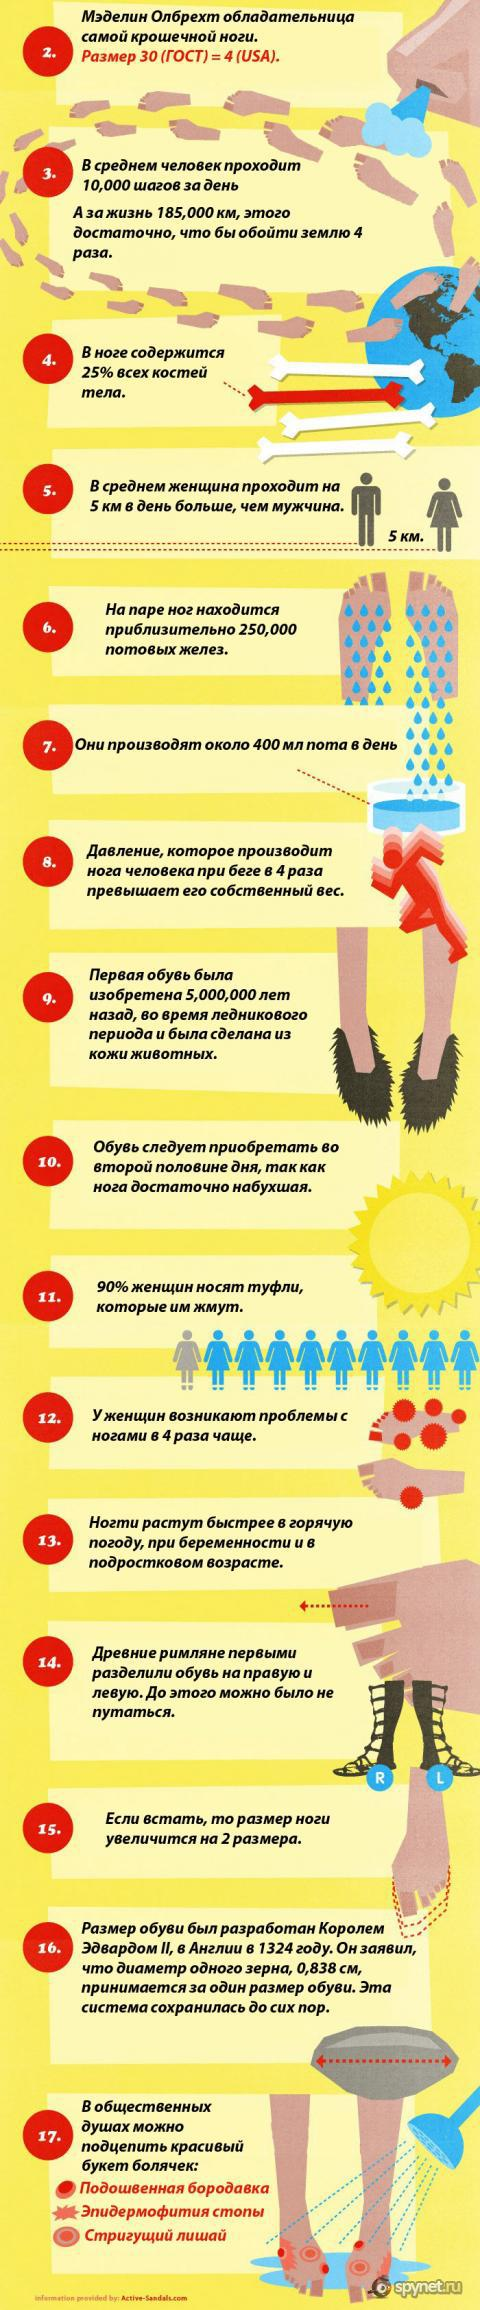 Факты о ногах.